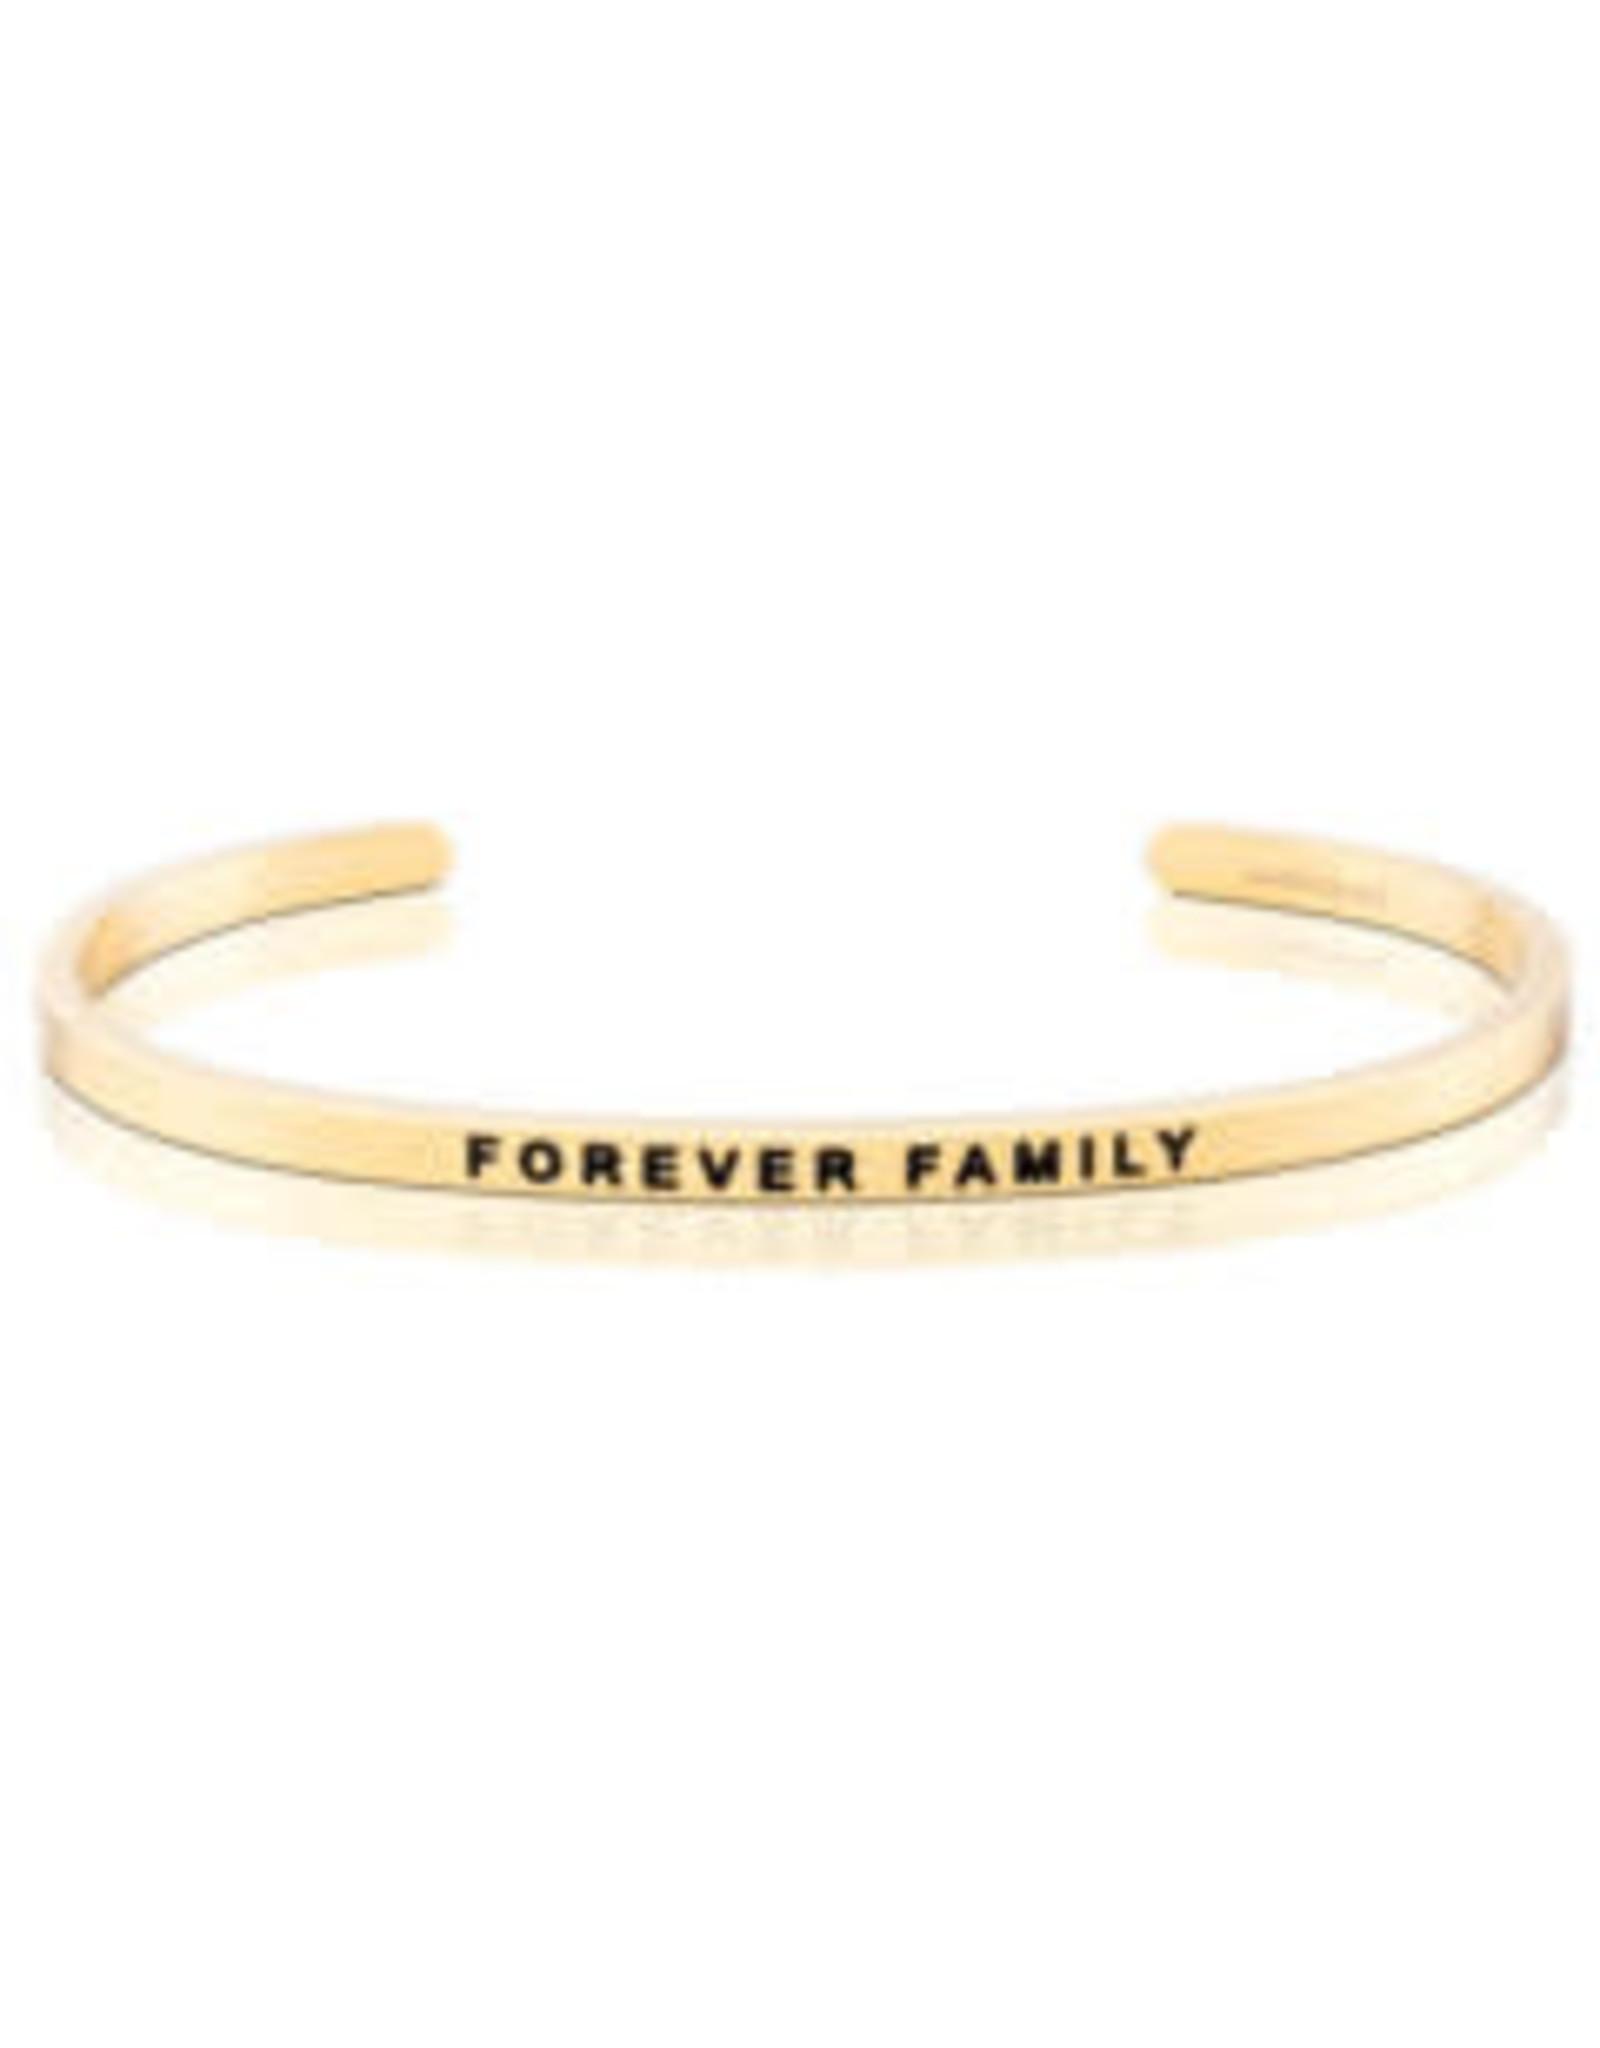 MantraBand MantraBand Bracelet, Forever Family